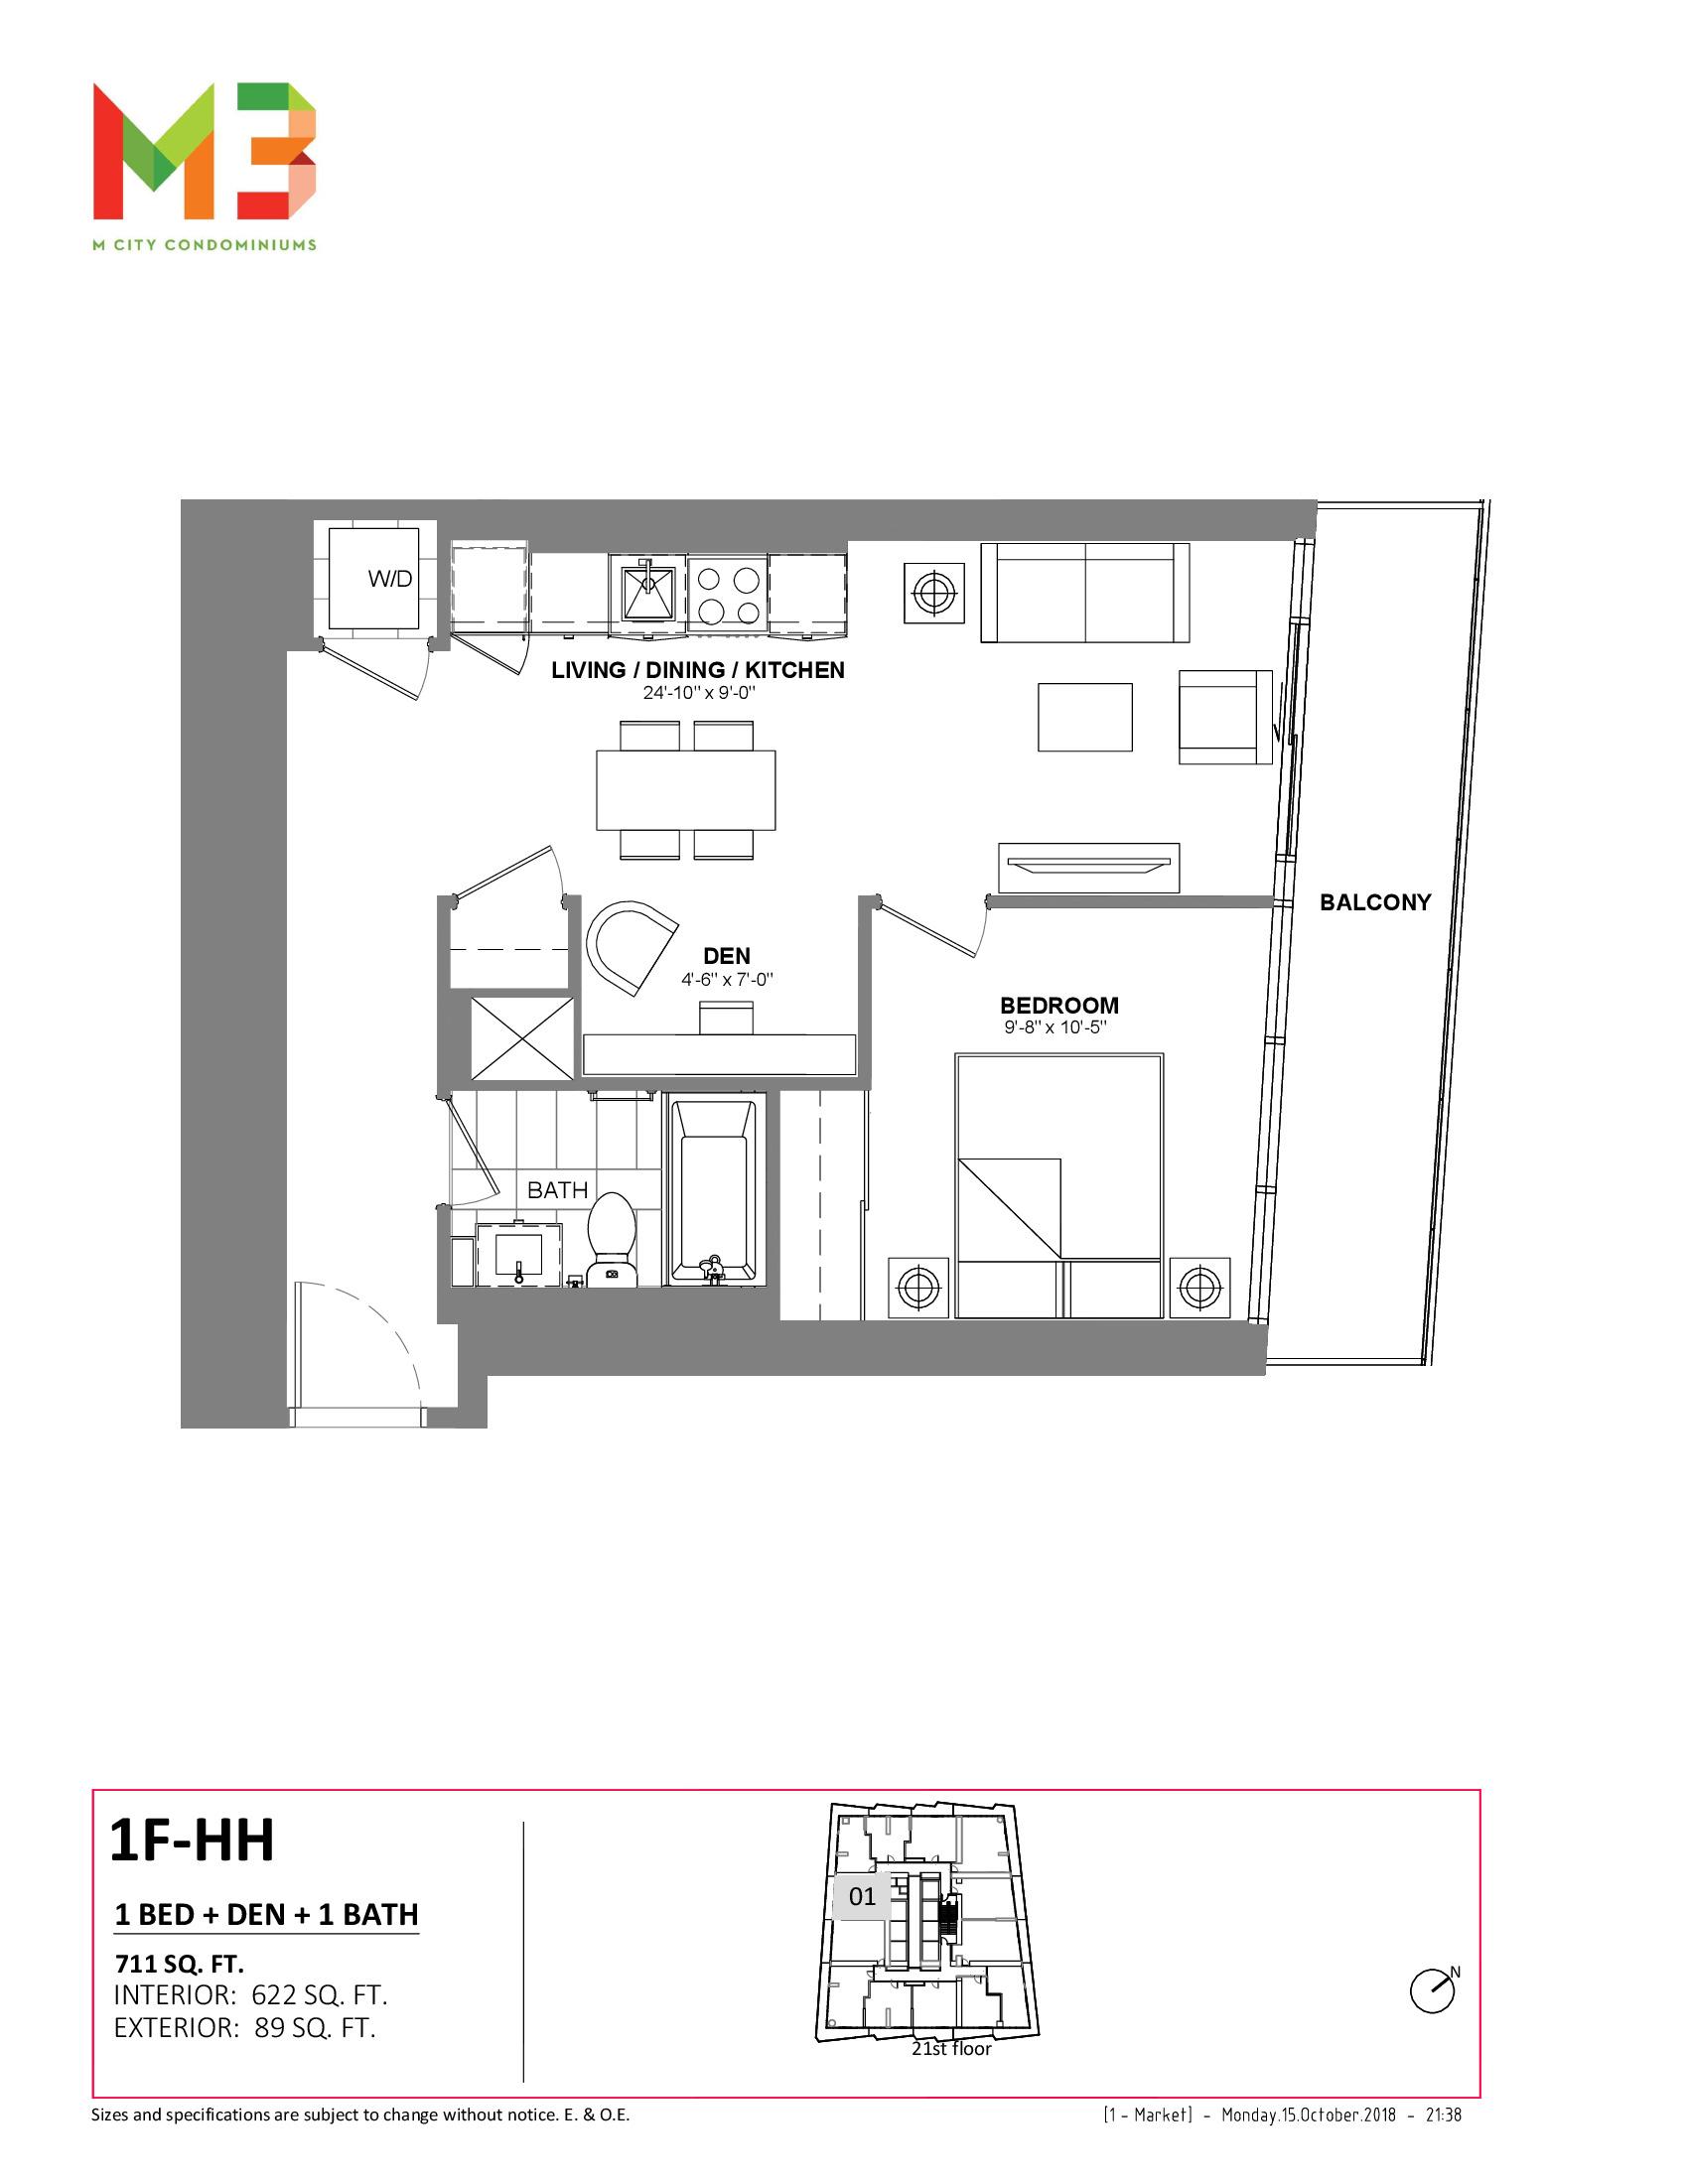 1F-HH Floor Plan at M3 Condos - 622 sq.ft